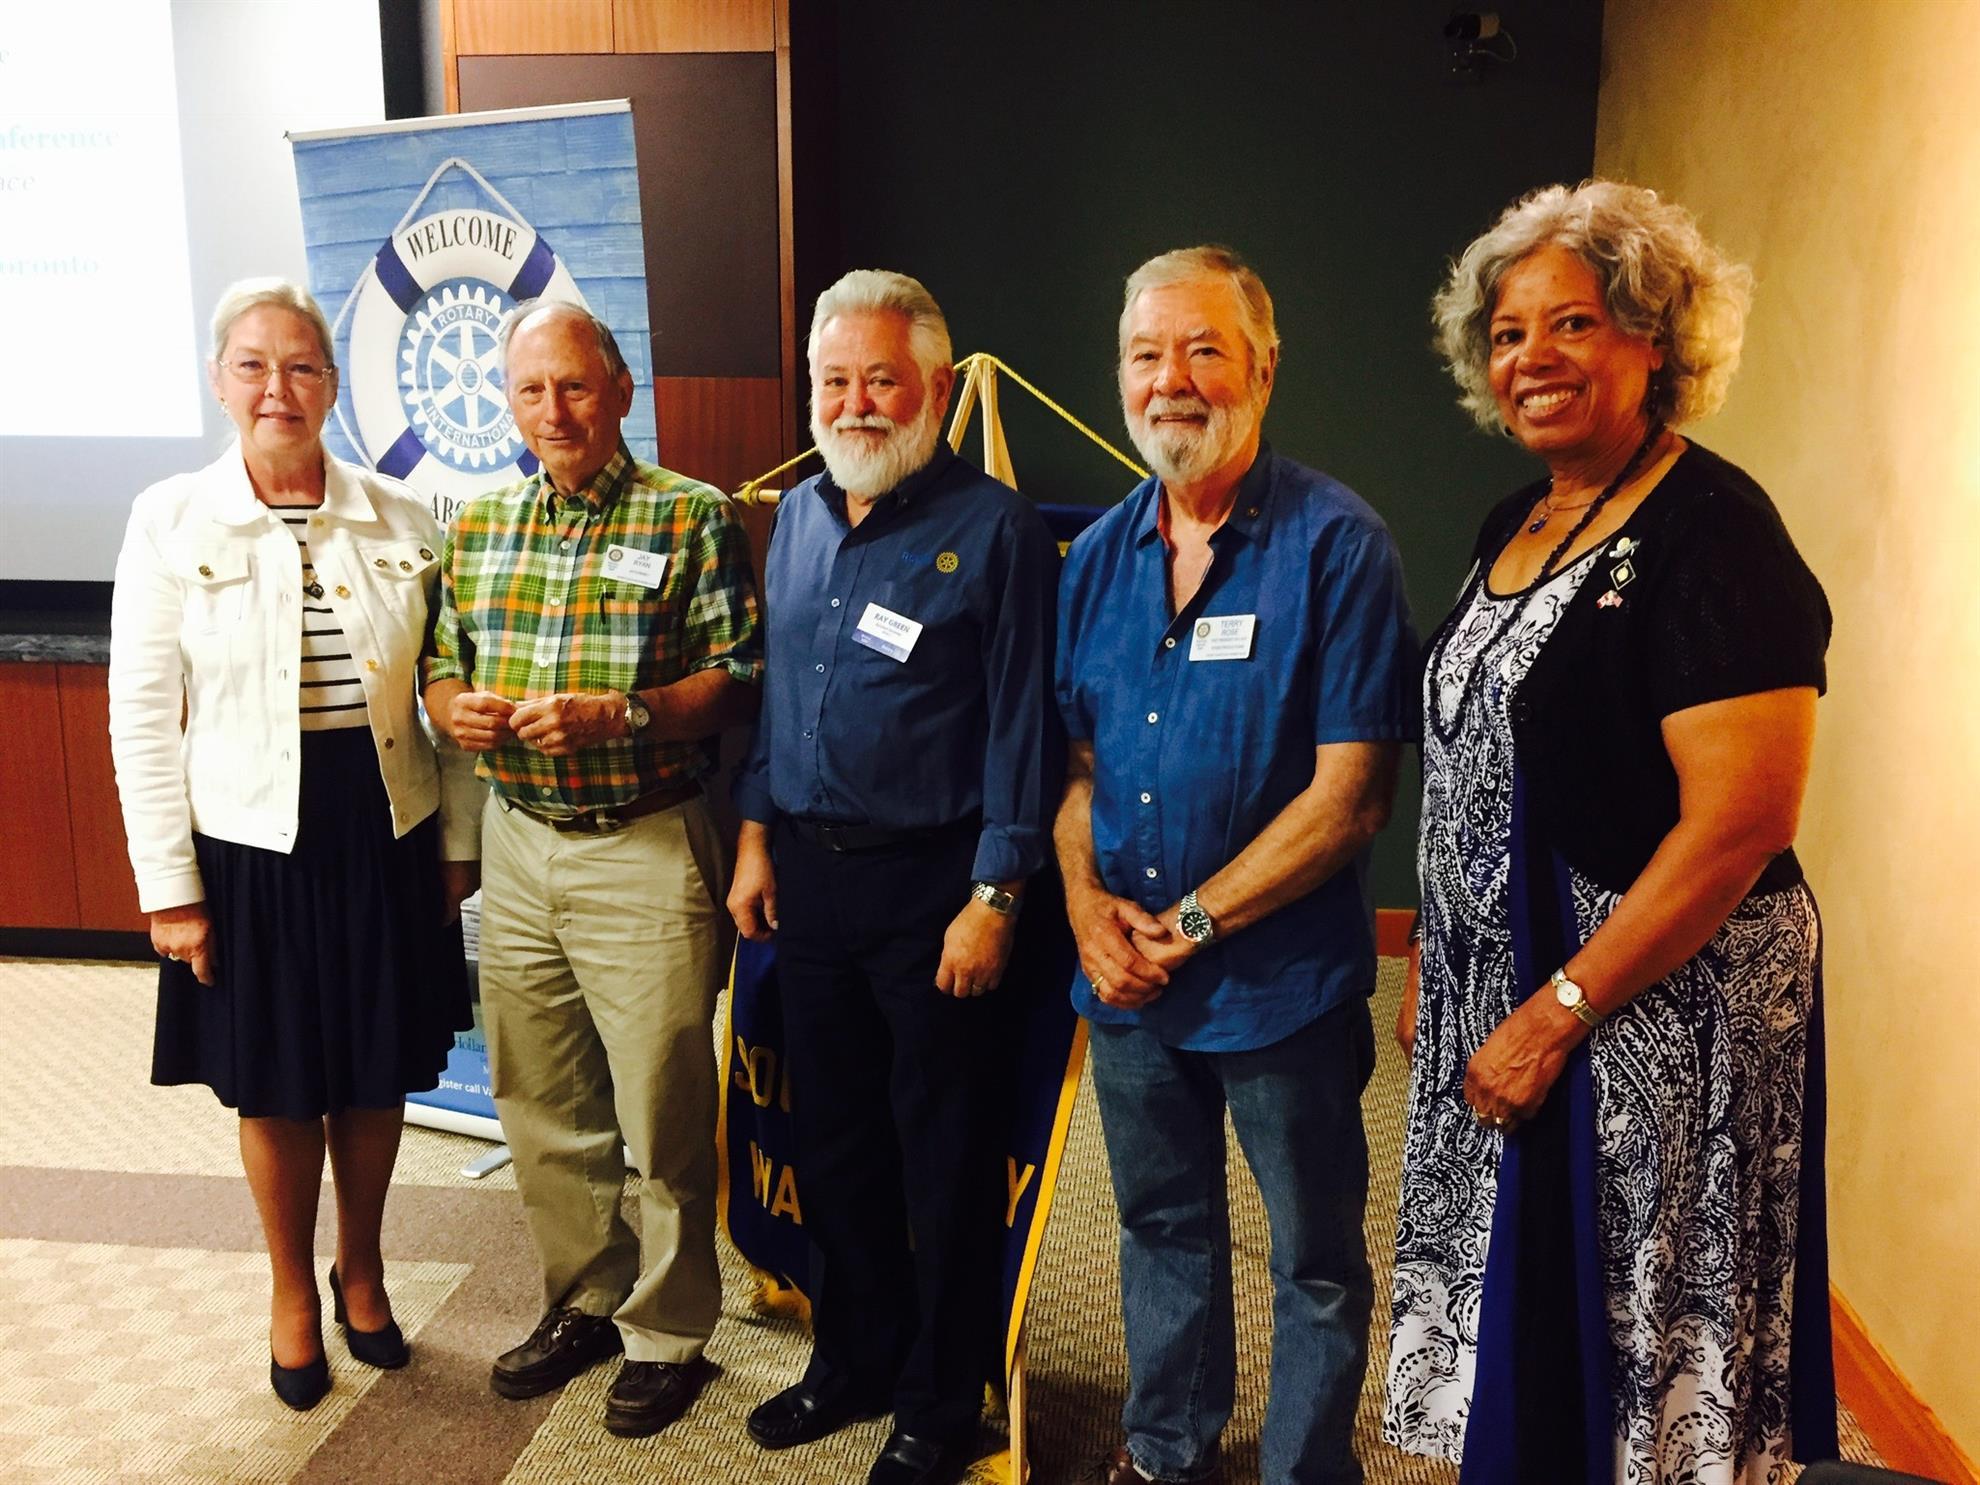 Northsound #1 dating service-senior people meet